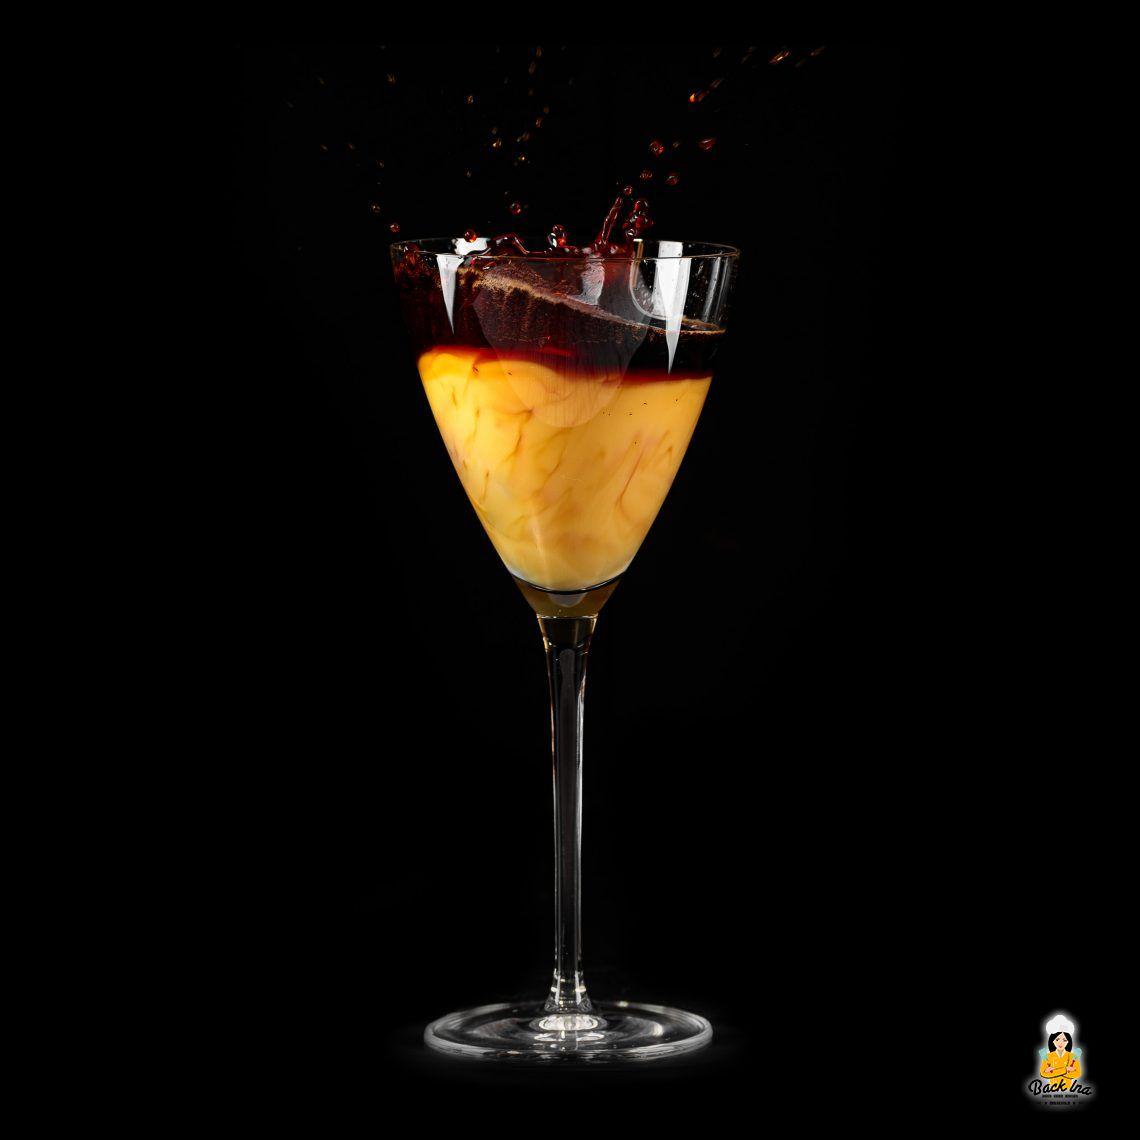 Food in Motion 4/20: Eierlikör Kaffee Cocktail